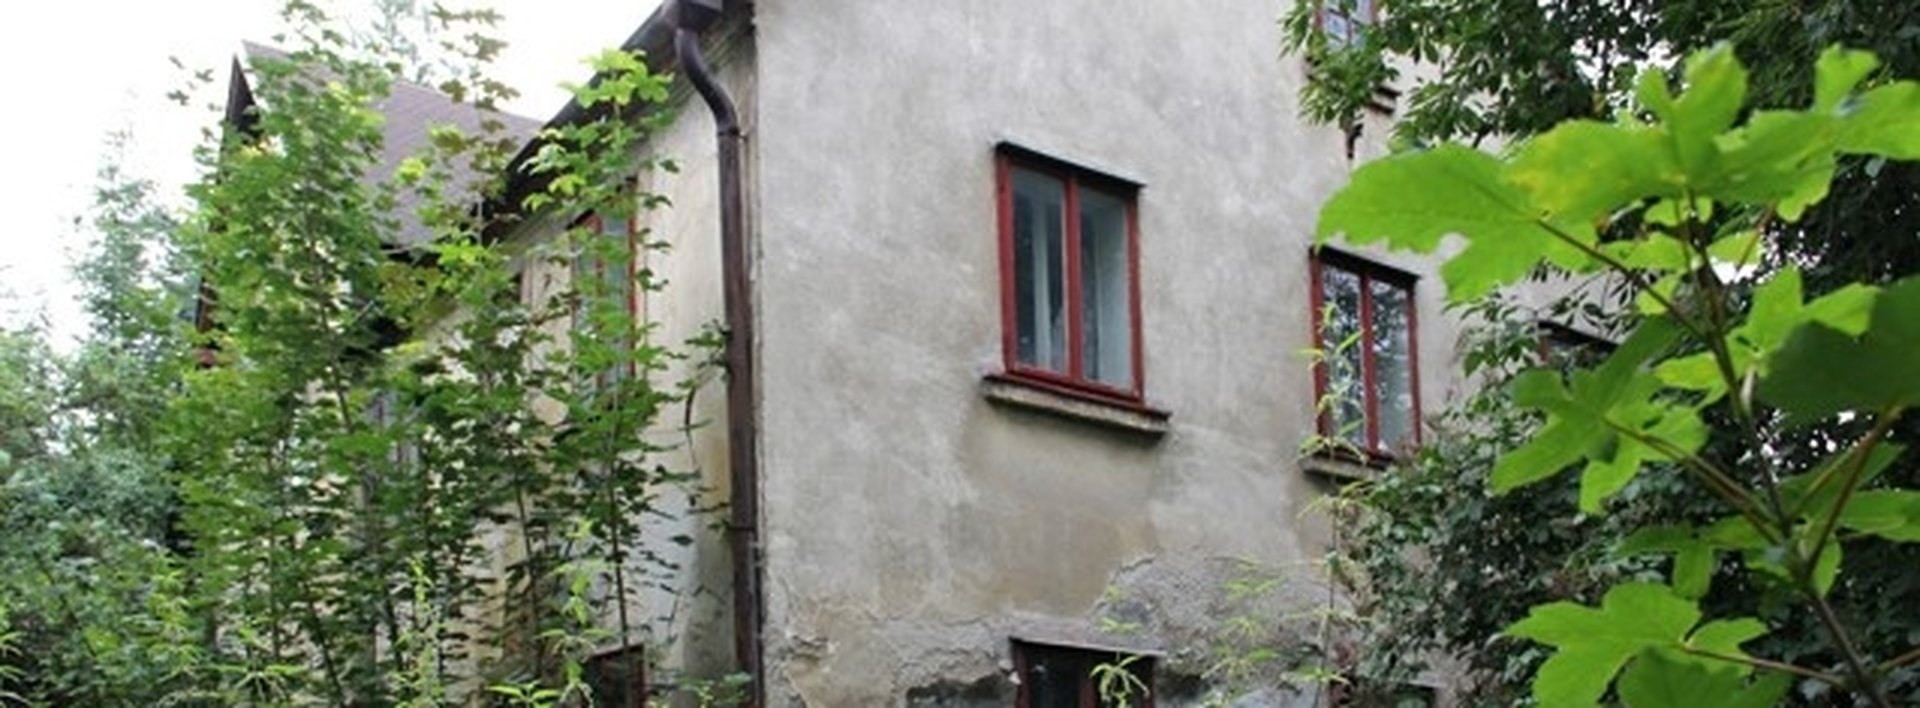 Prodej Bytového domu, zastavěná plocha 414m² - Liberec X-Františkov, Ev.č.: N47802